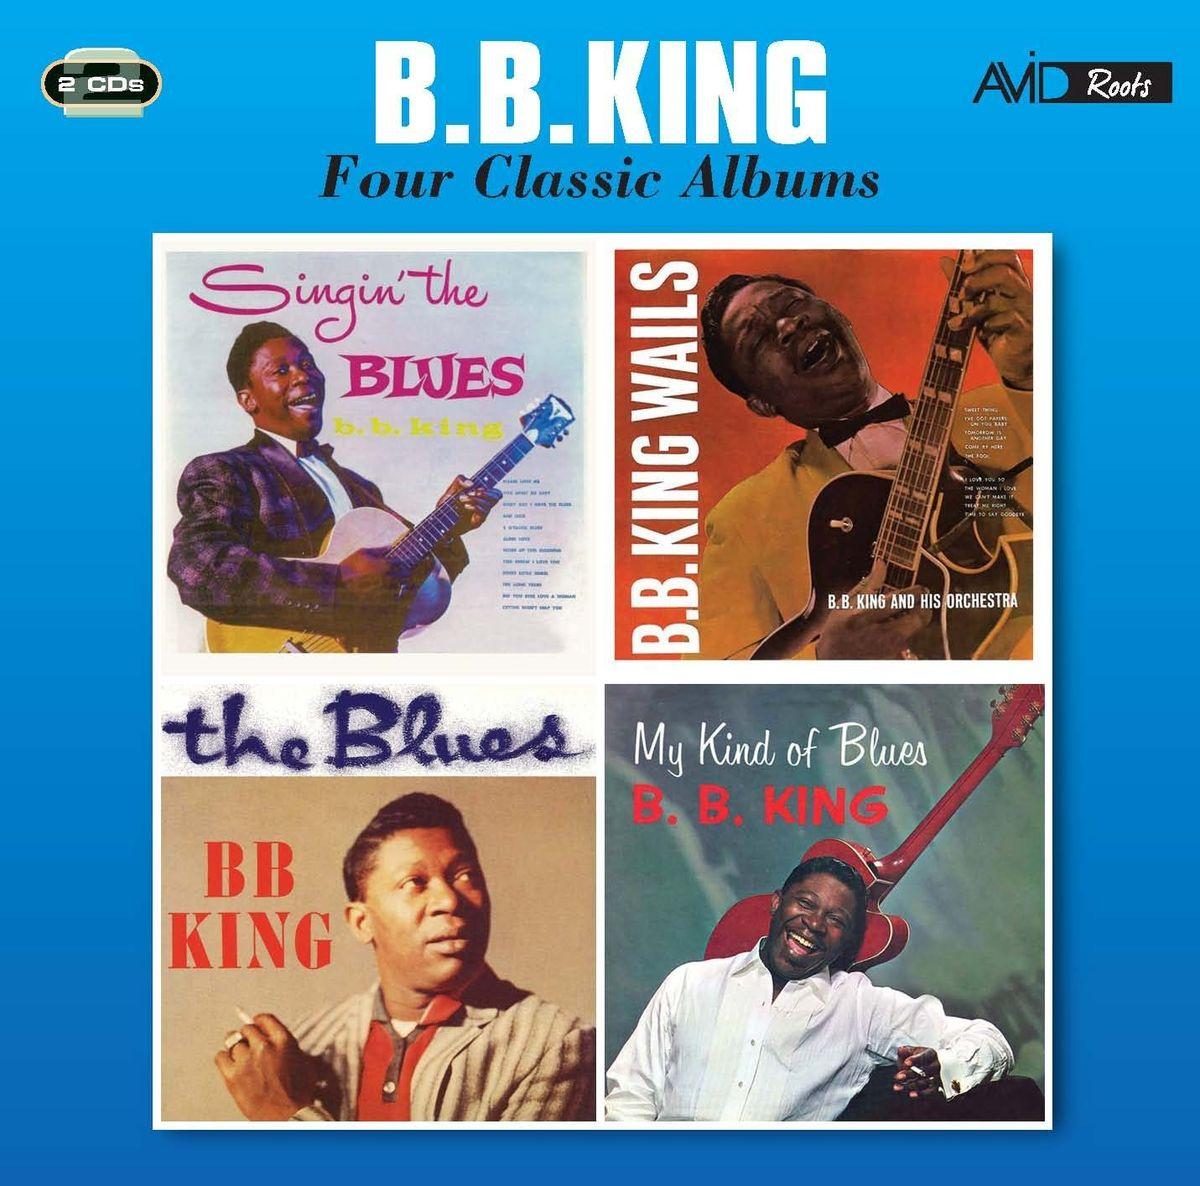 цена на B. B. King. B. B. King - Four Classic Albums (2 CD)